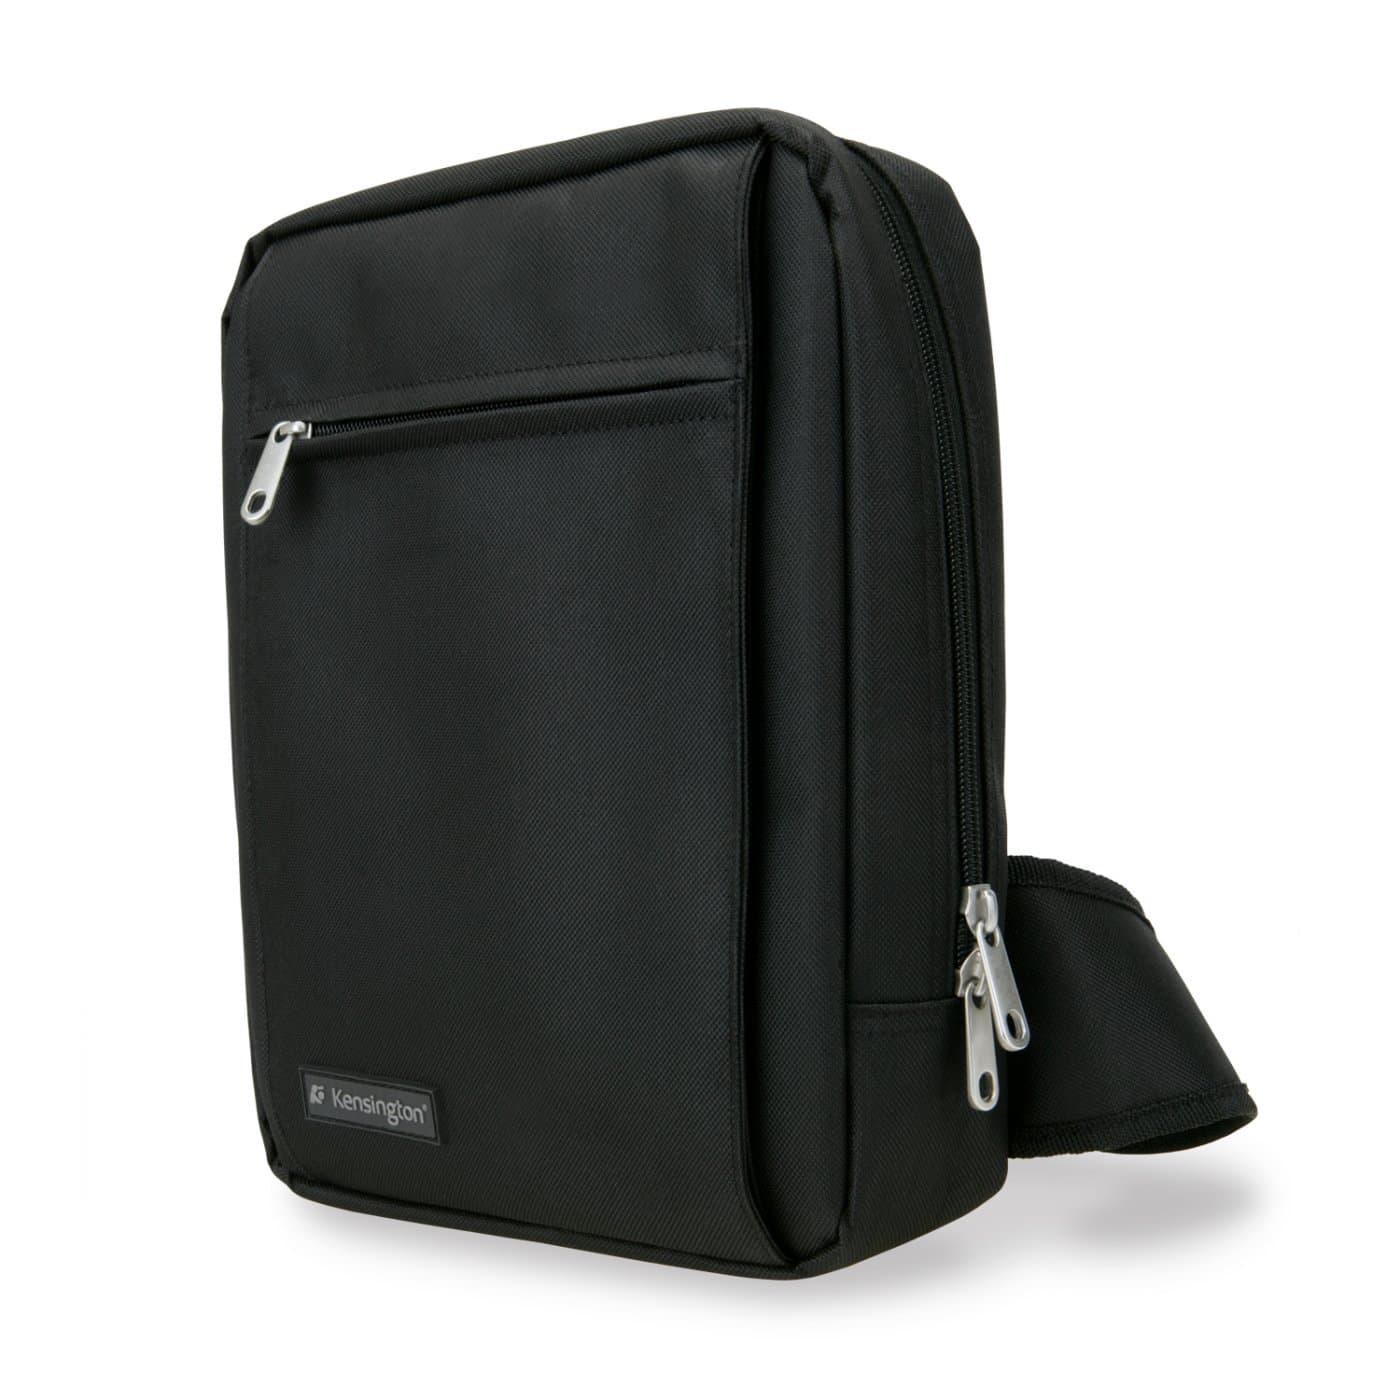 Kensington - Products - Laptop Bags - Backpacks - Sling 10.2 ...